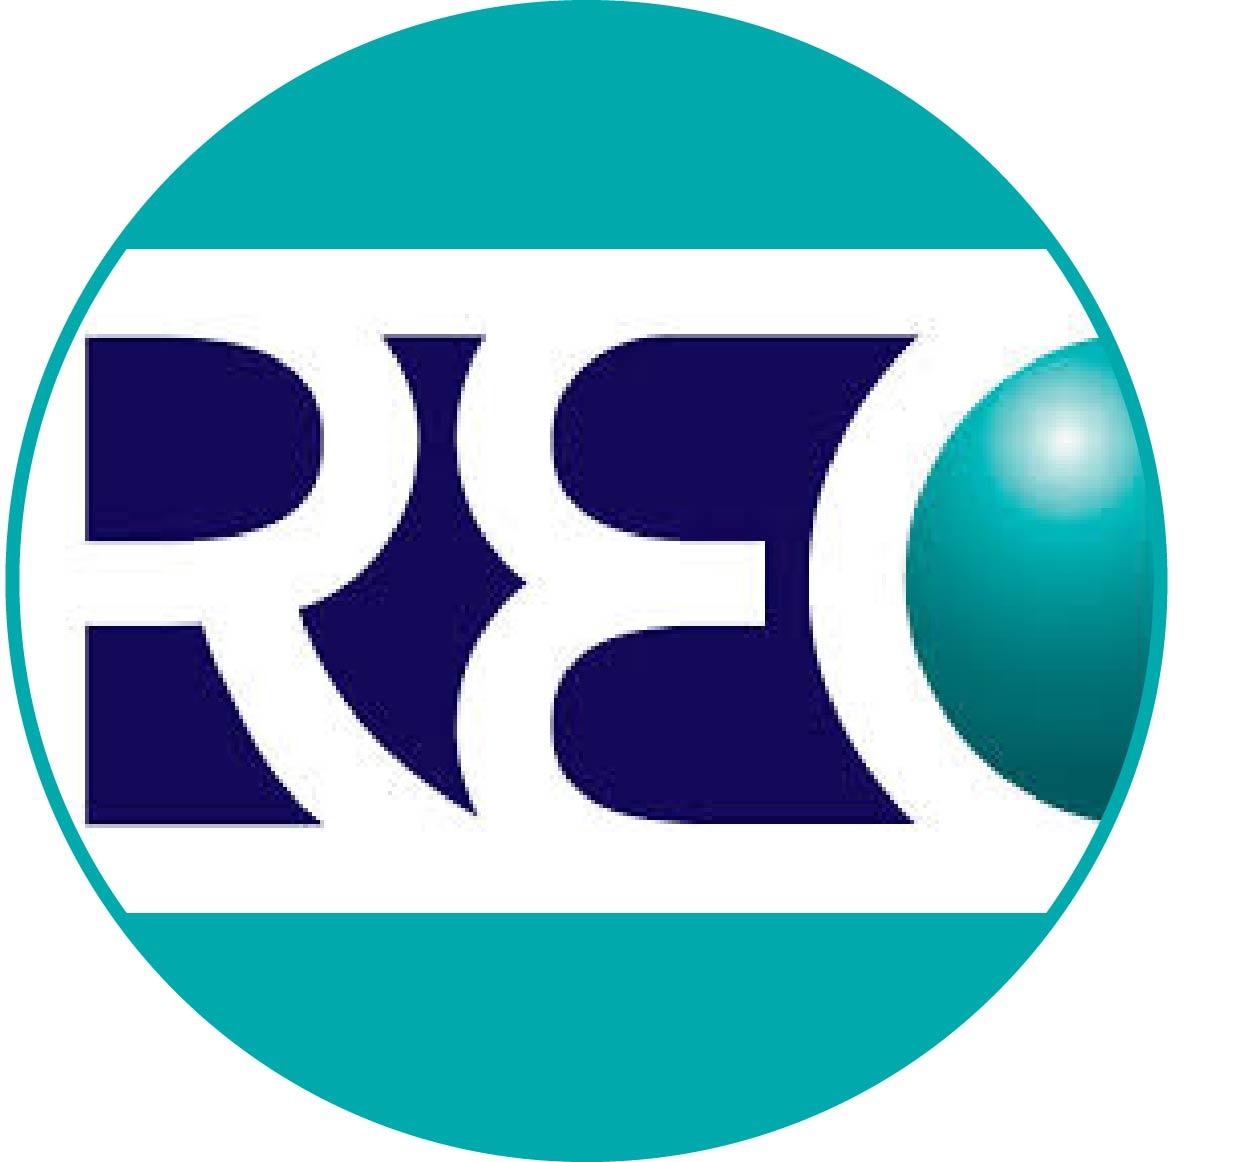 REC_logo_rounded.jpg